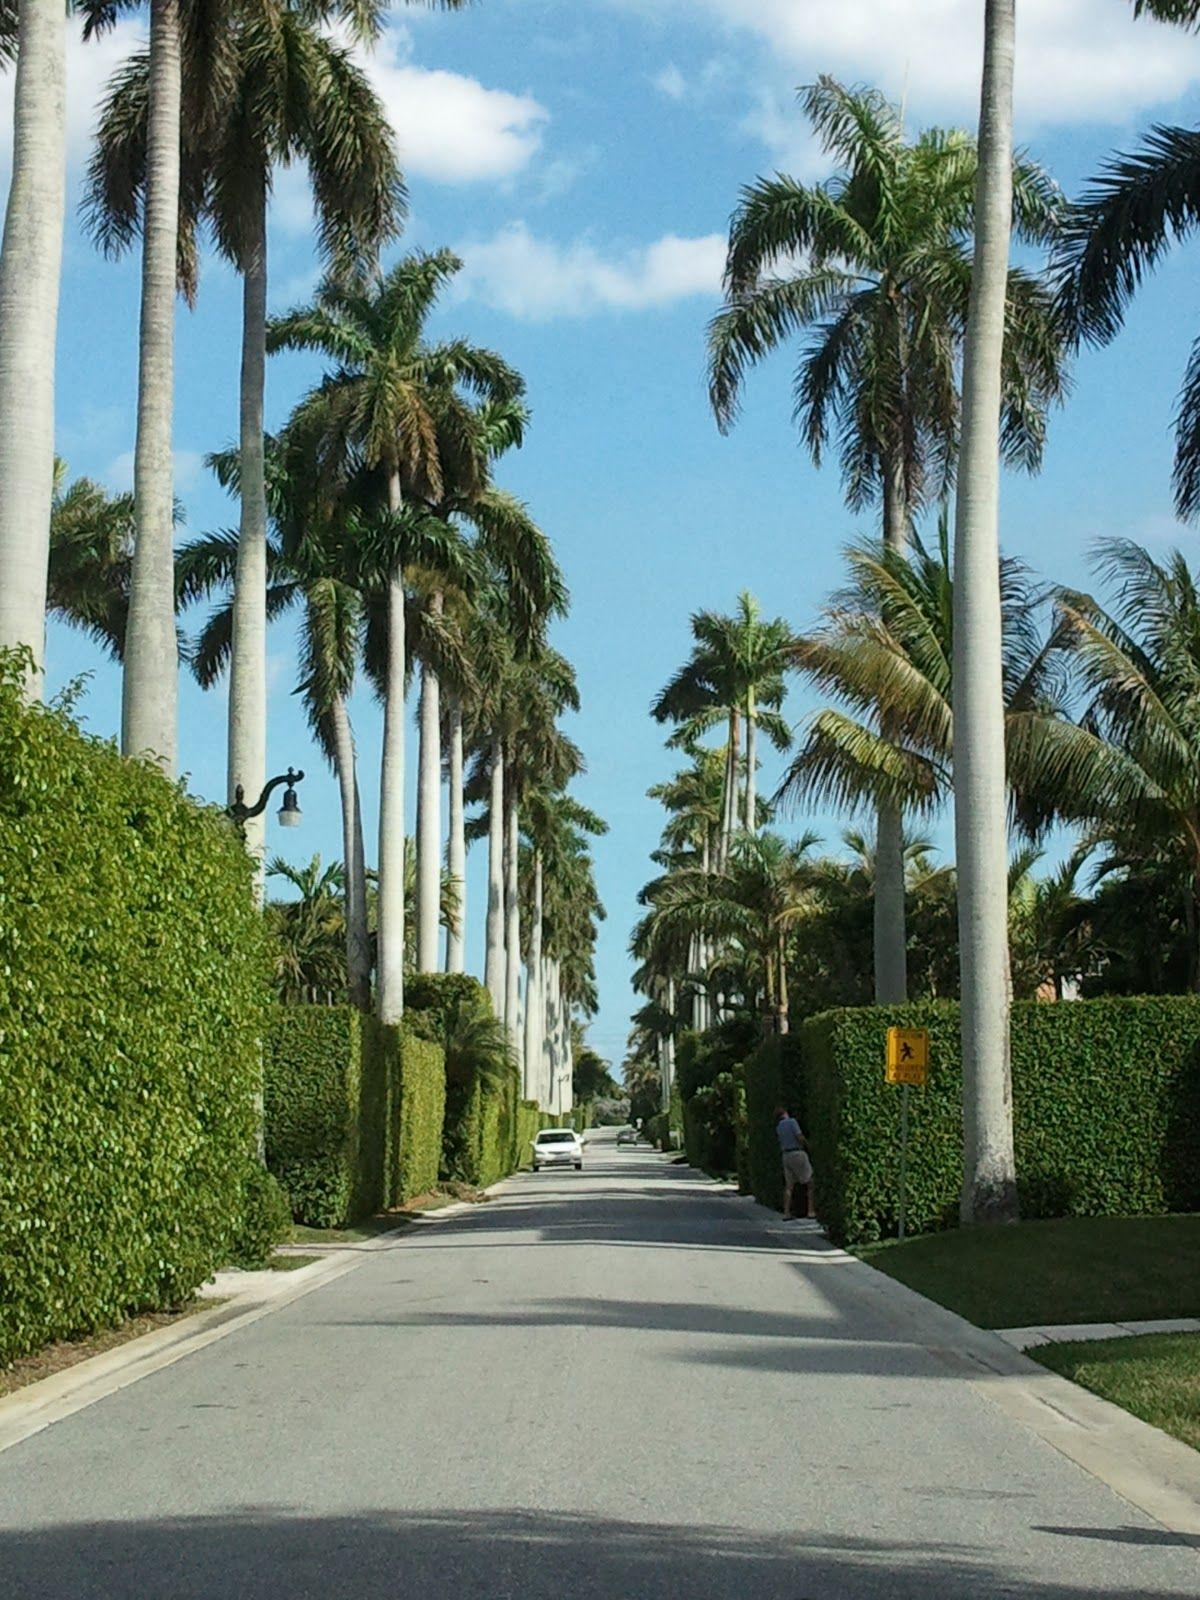 9a8e14405e64c23549a6a9bbfab164a5 - Pnc Bank Locations Palm Beach Gardens